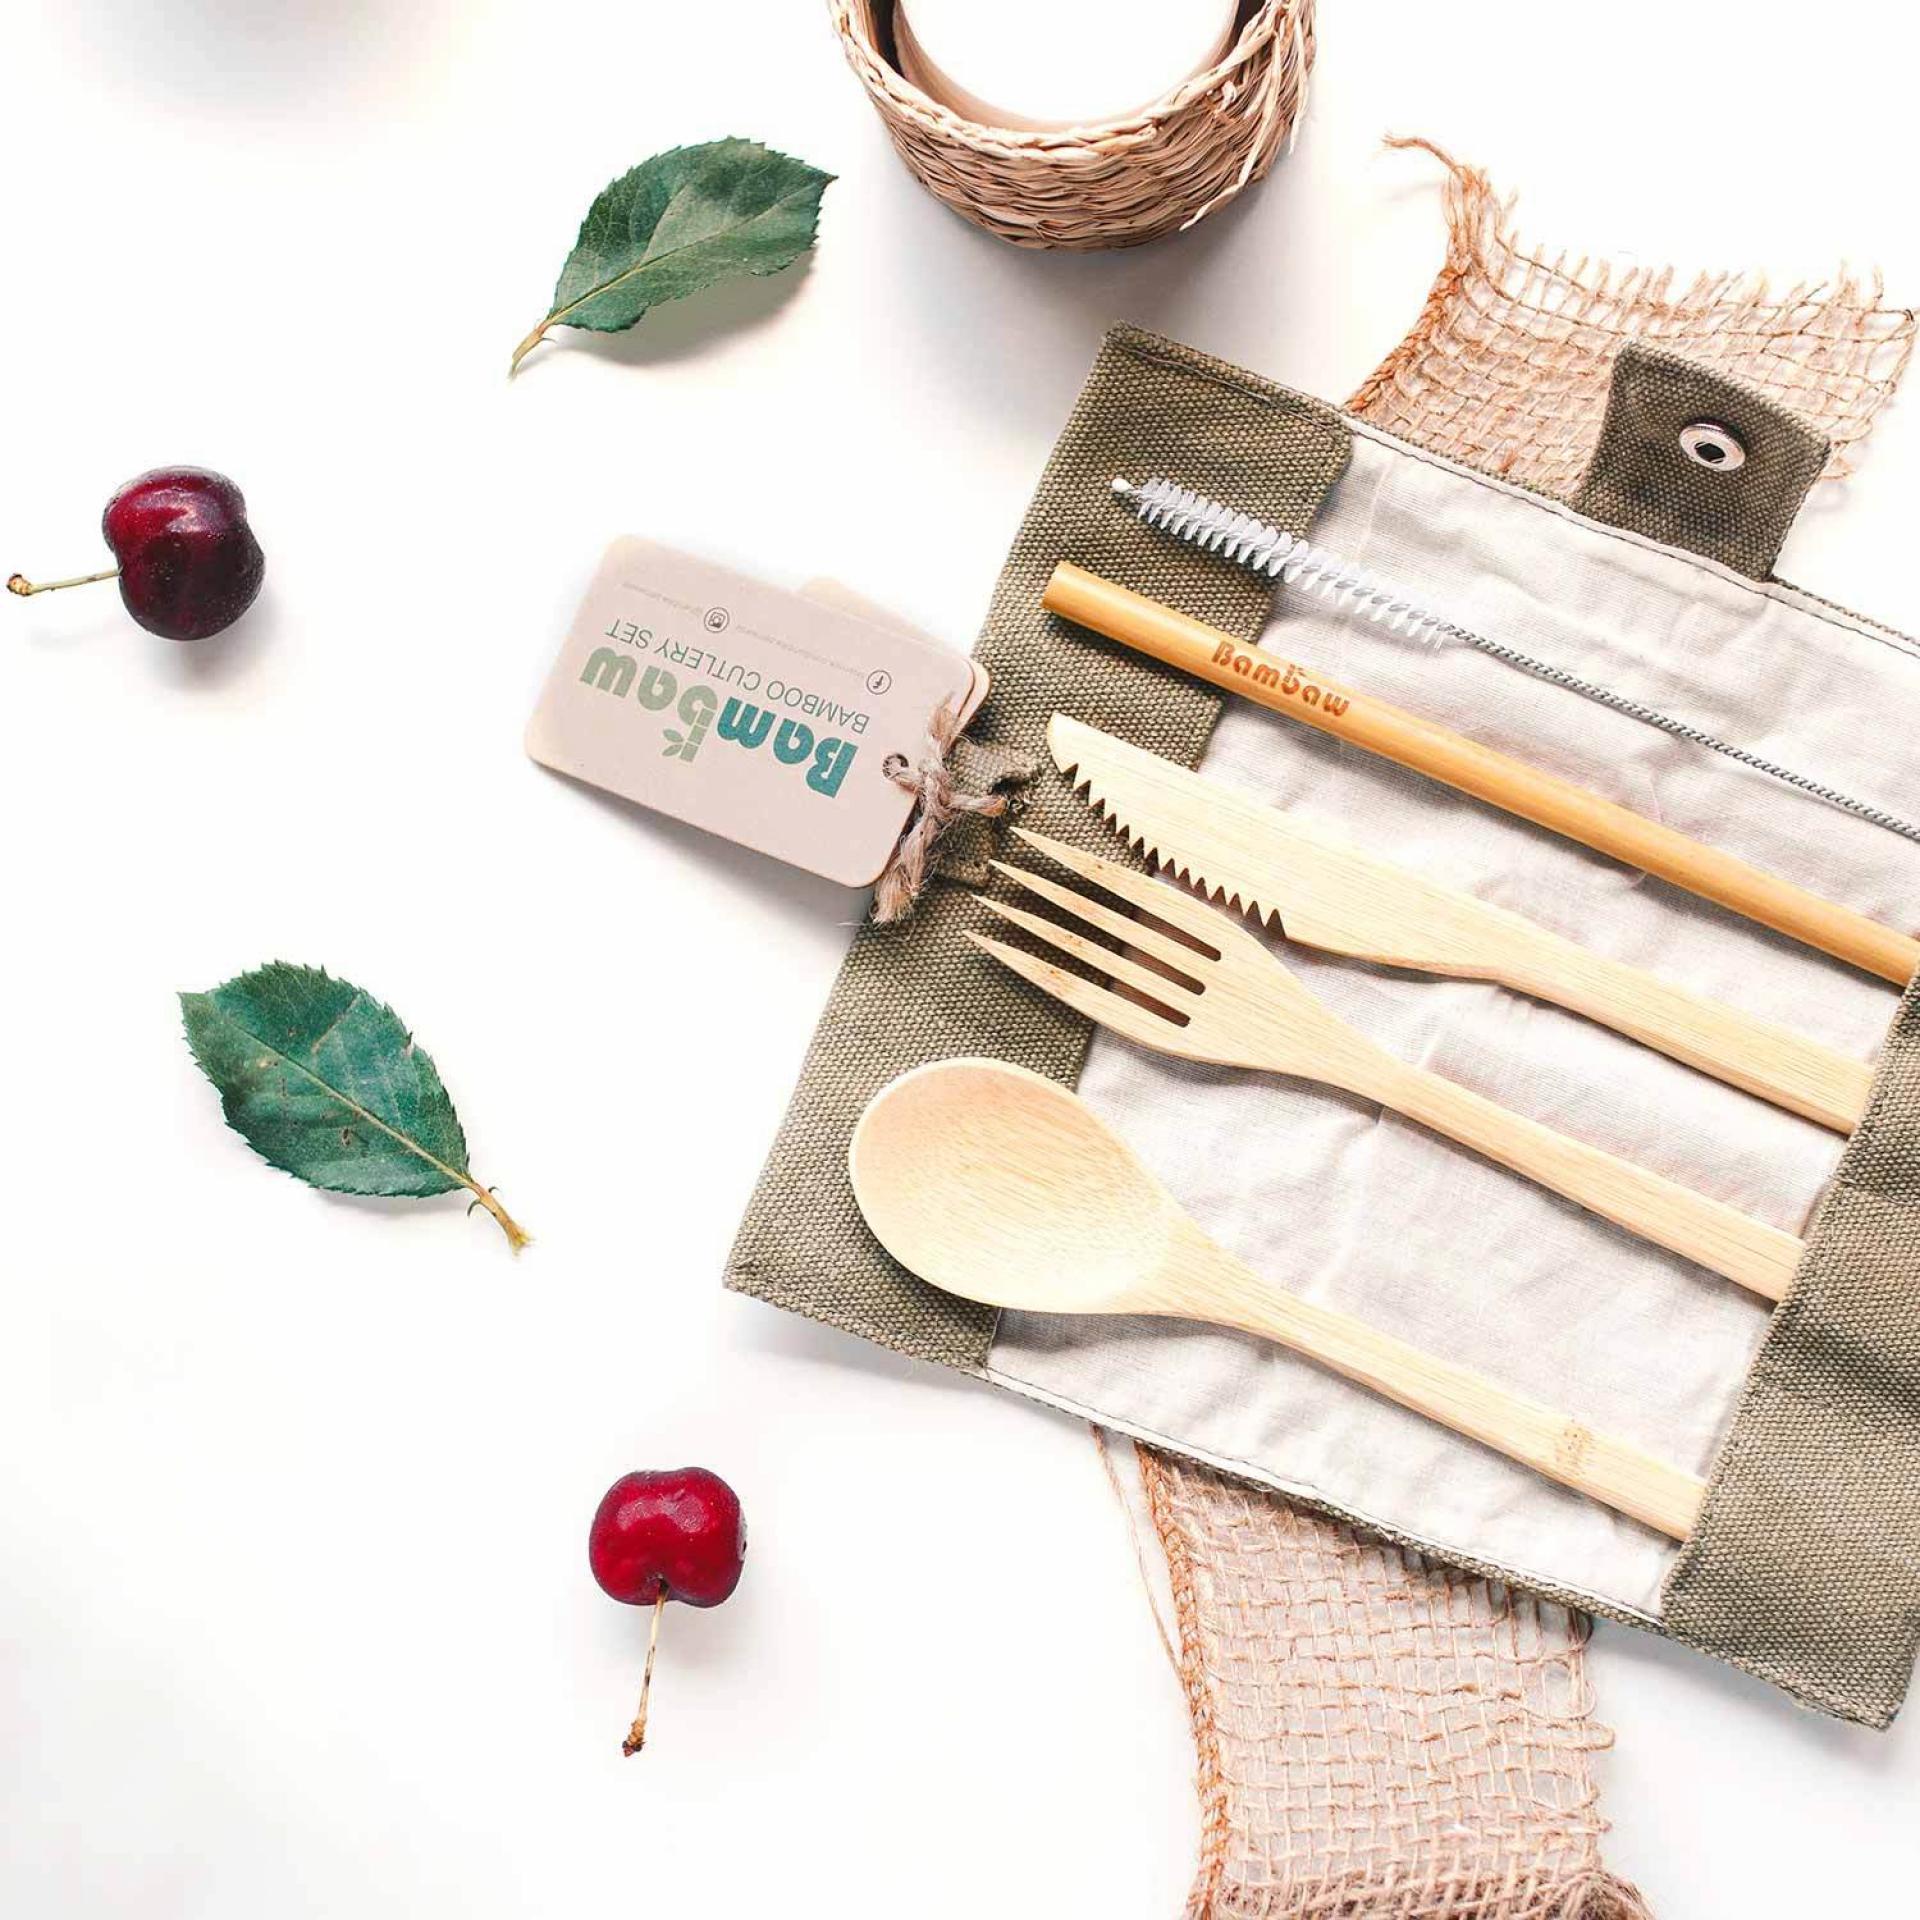 Christmas Gift Guide: Bambaw cutlery set